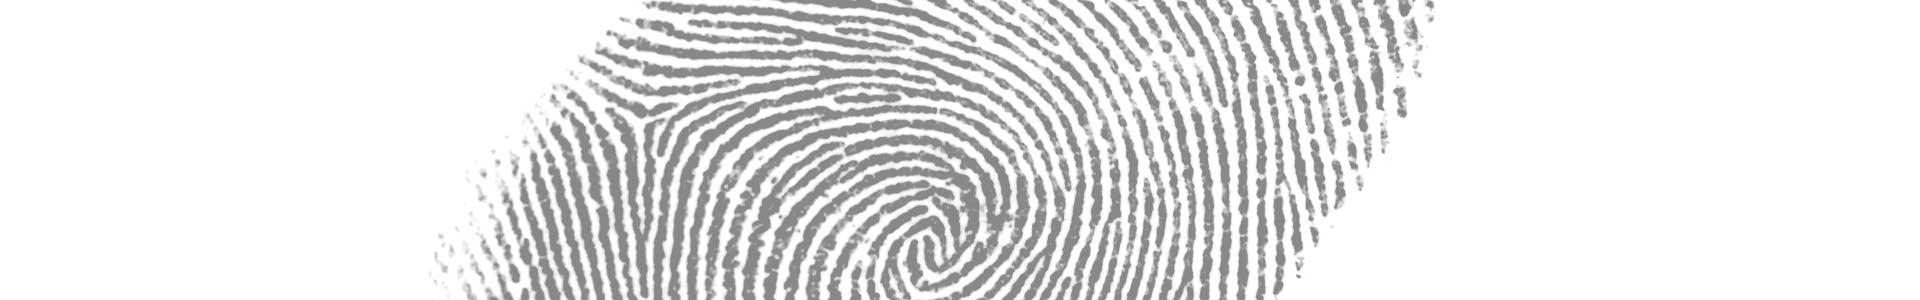 Fingerprinting Services